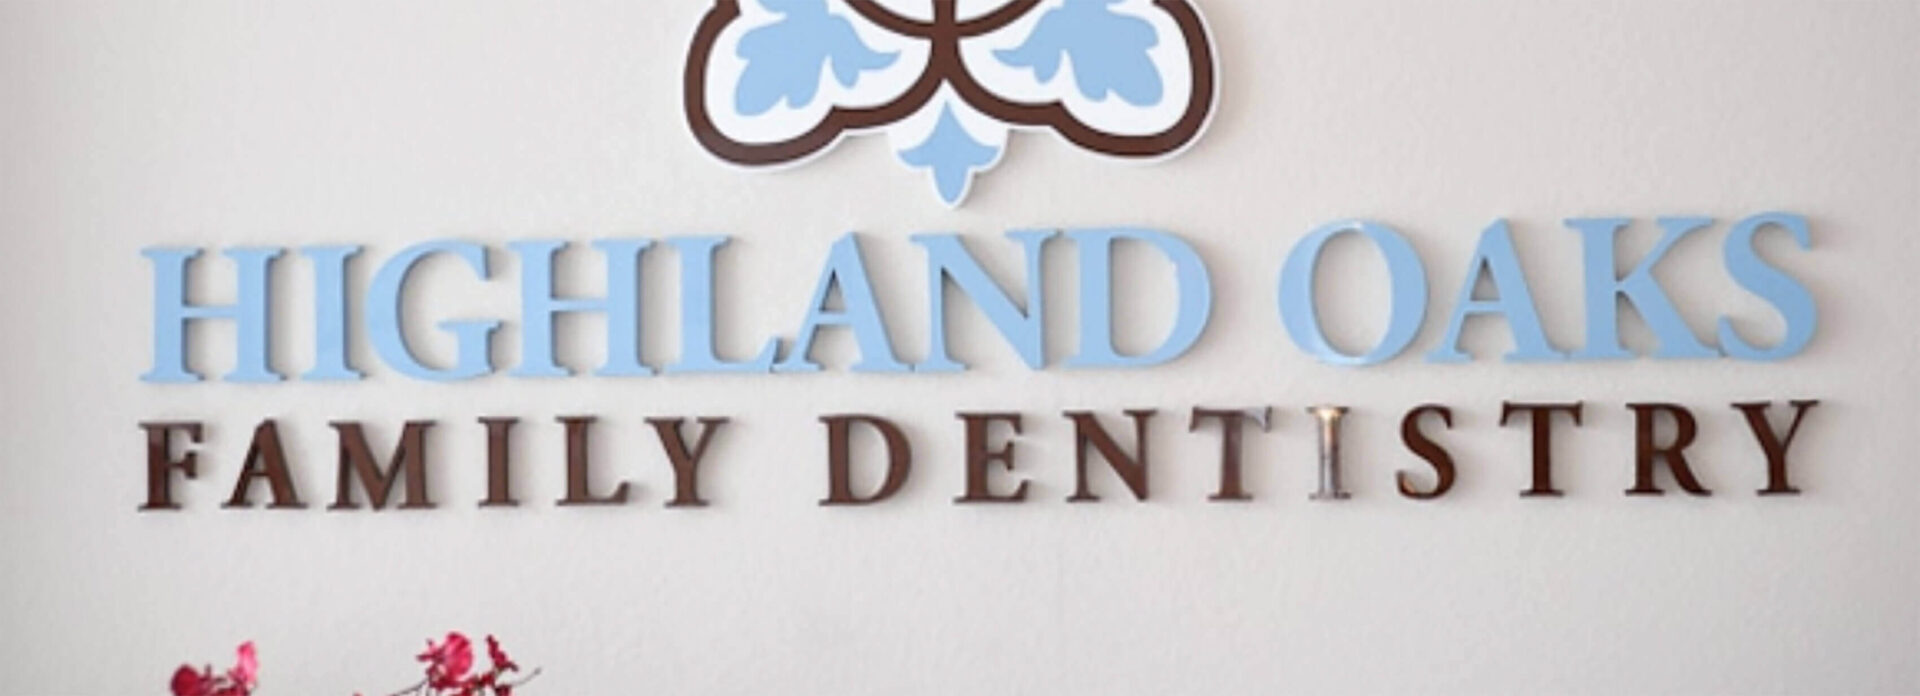 Highland Oaks Family Dentistry interior office logo